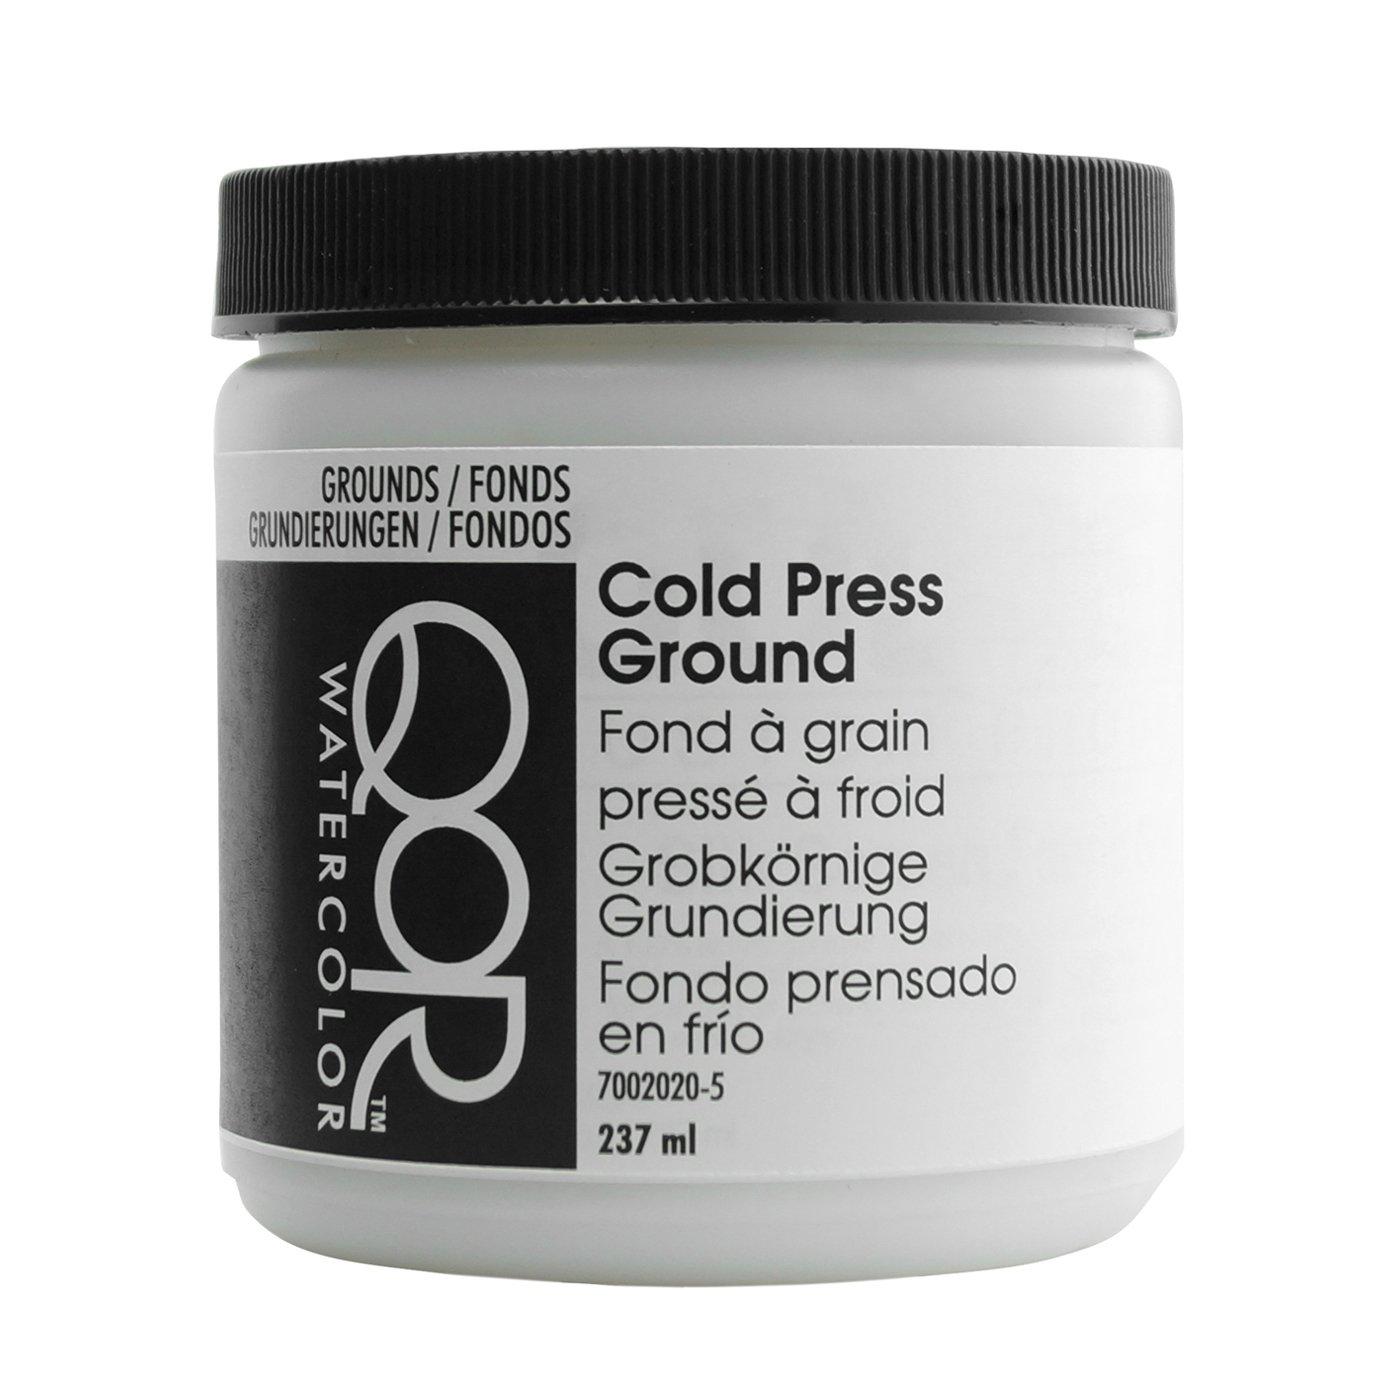 QoR Cold Pressed Ground 237ml